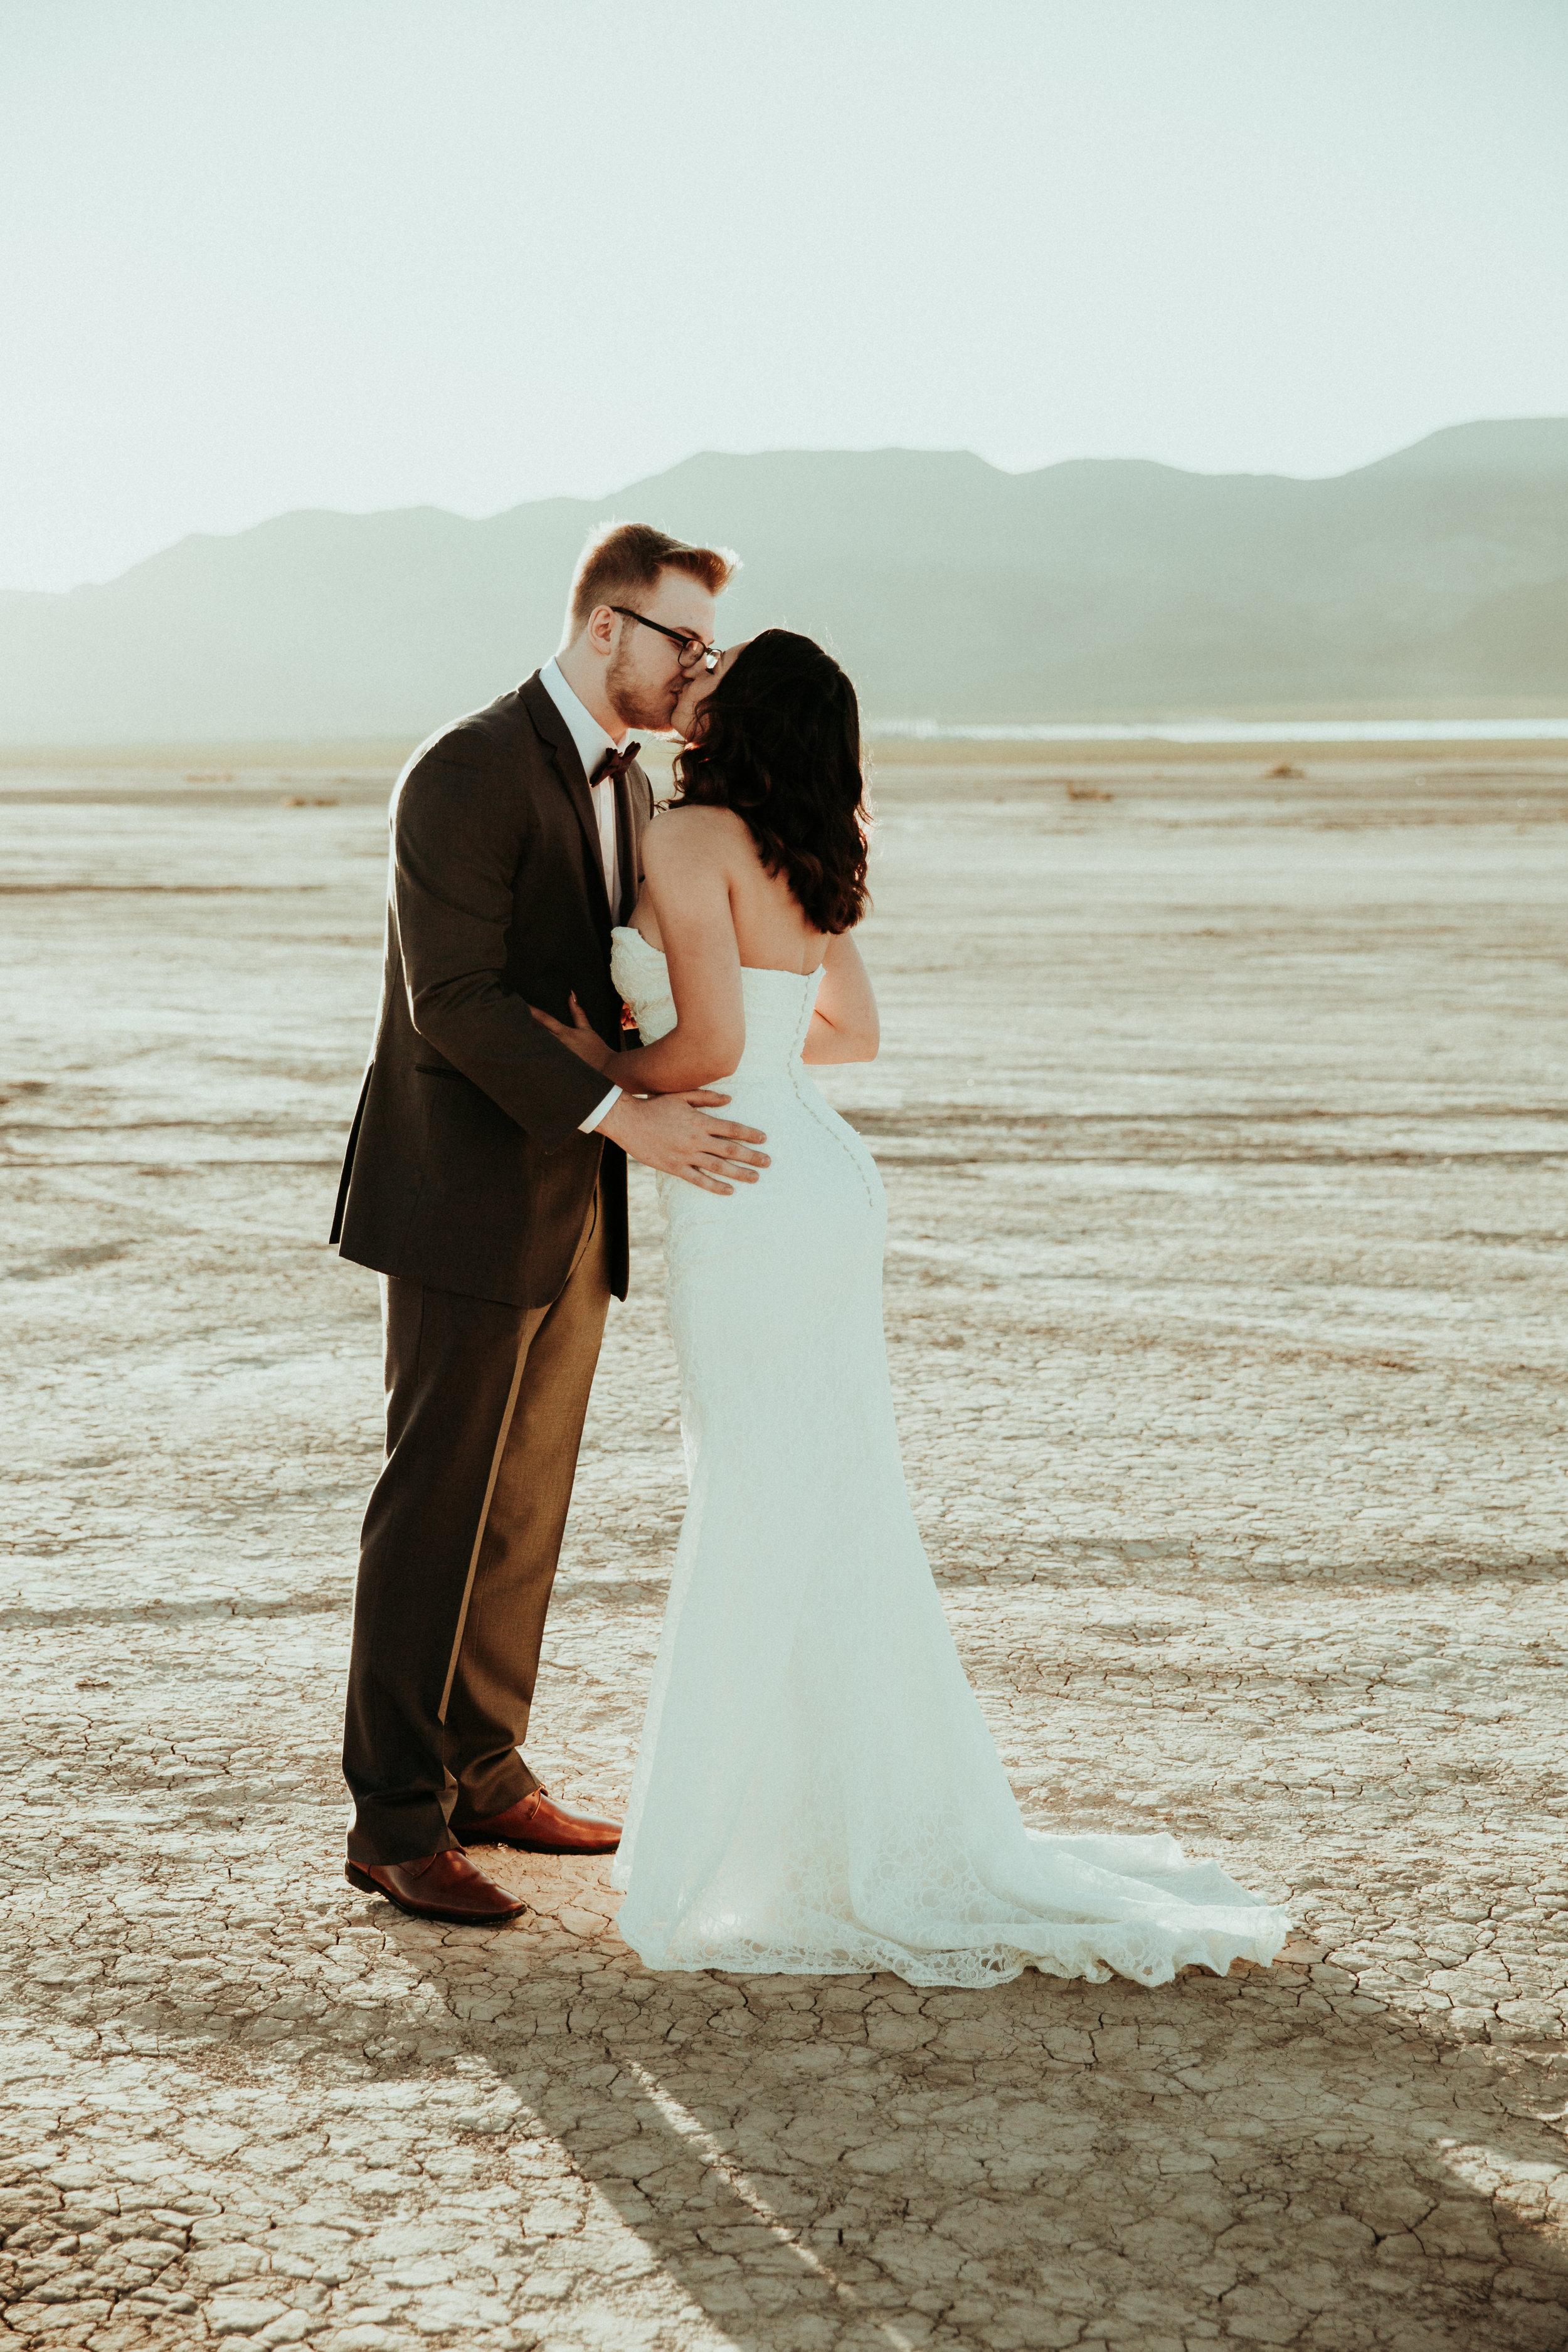 Las Vegas Wedding - Daniel + Jessica - Henderson Wedding Photographer - Seattle Wedding Photographer - Oregon Elopement Photographer - First Look